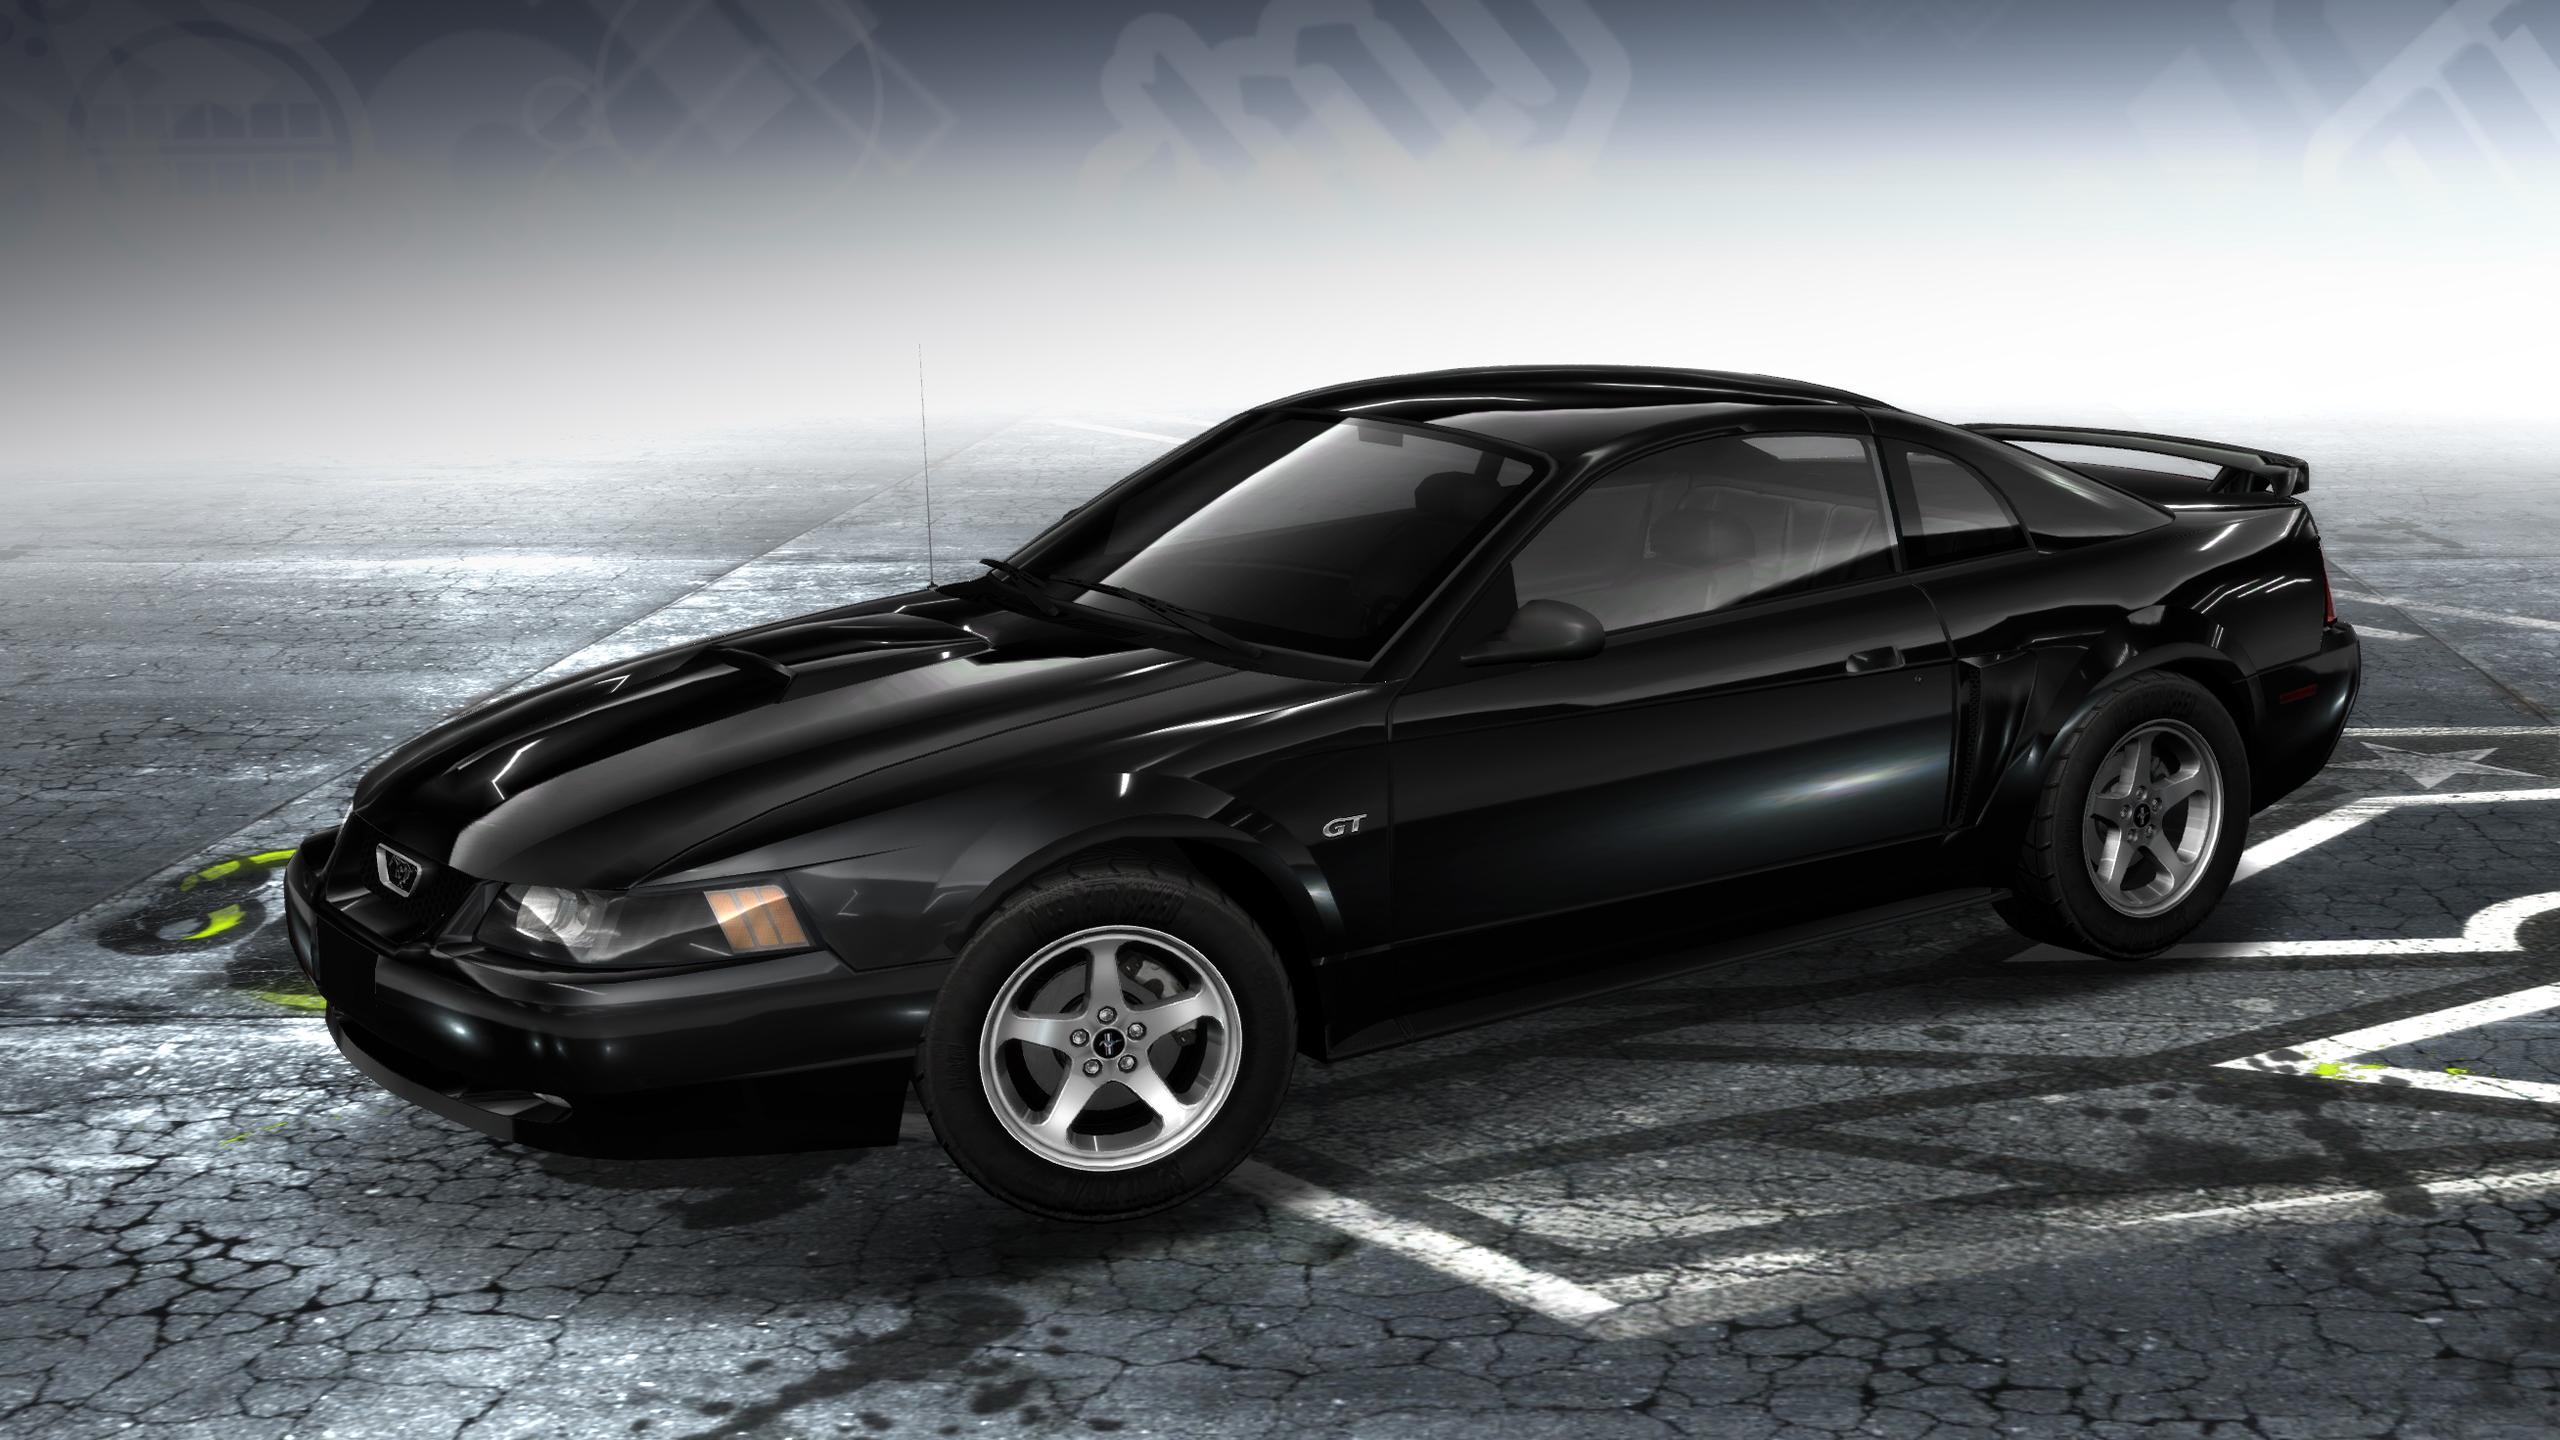 Ford Mustang GT (Gen. 4)